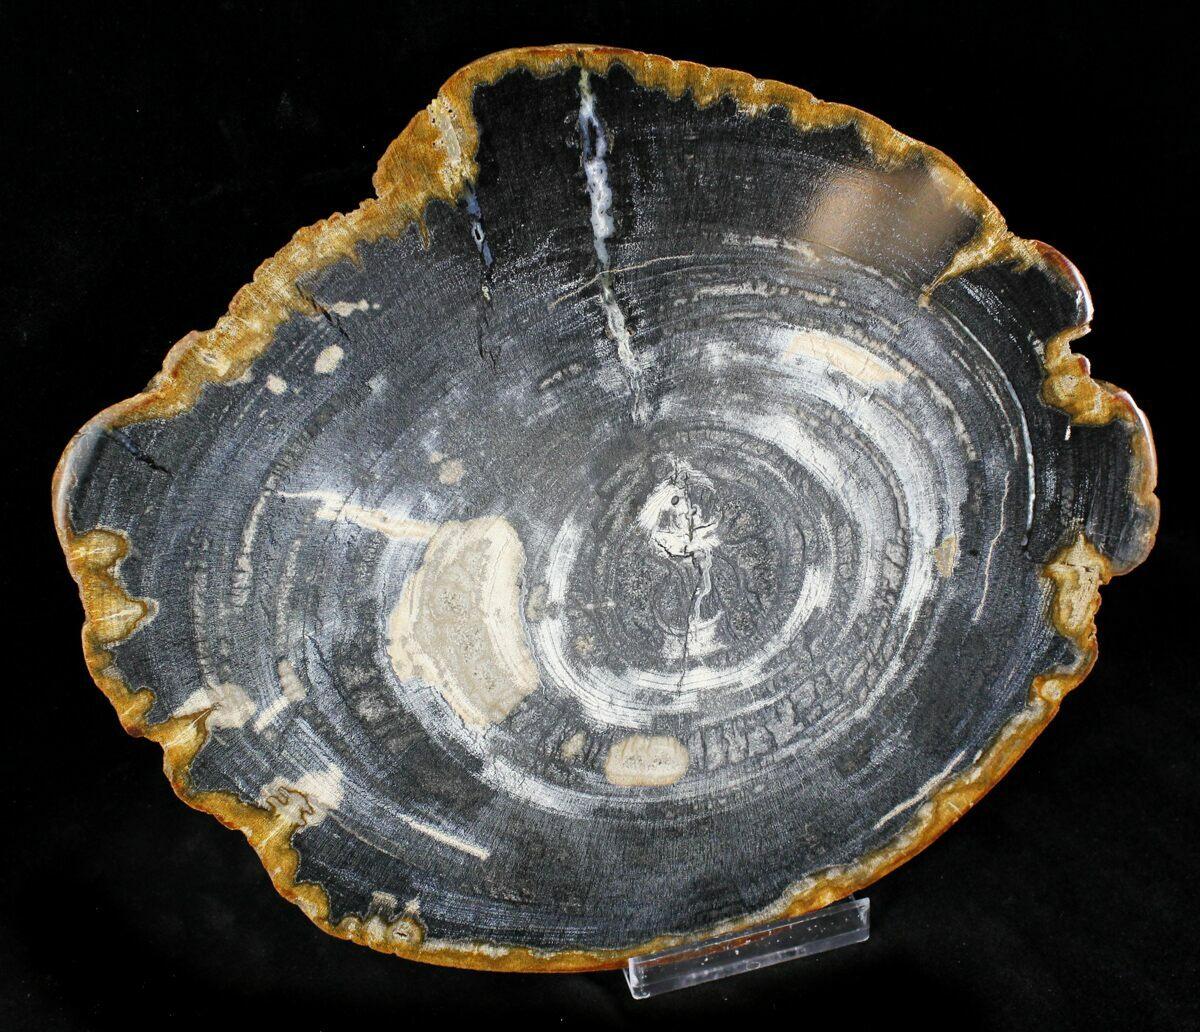 9.5 Petrified Wood (Tropical Hardwood) Slab - Indonesia